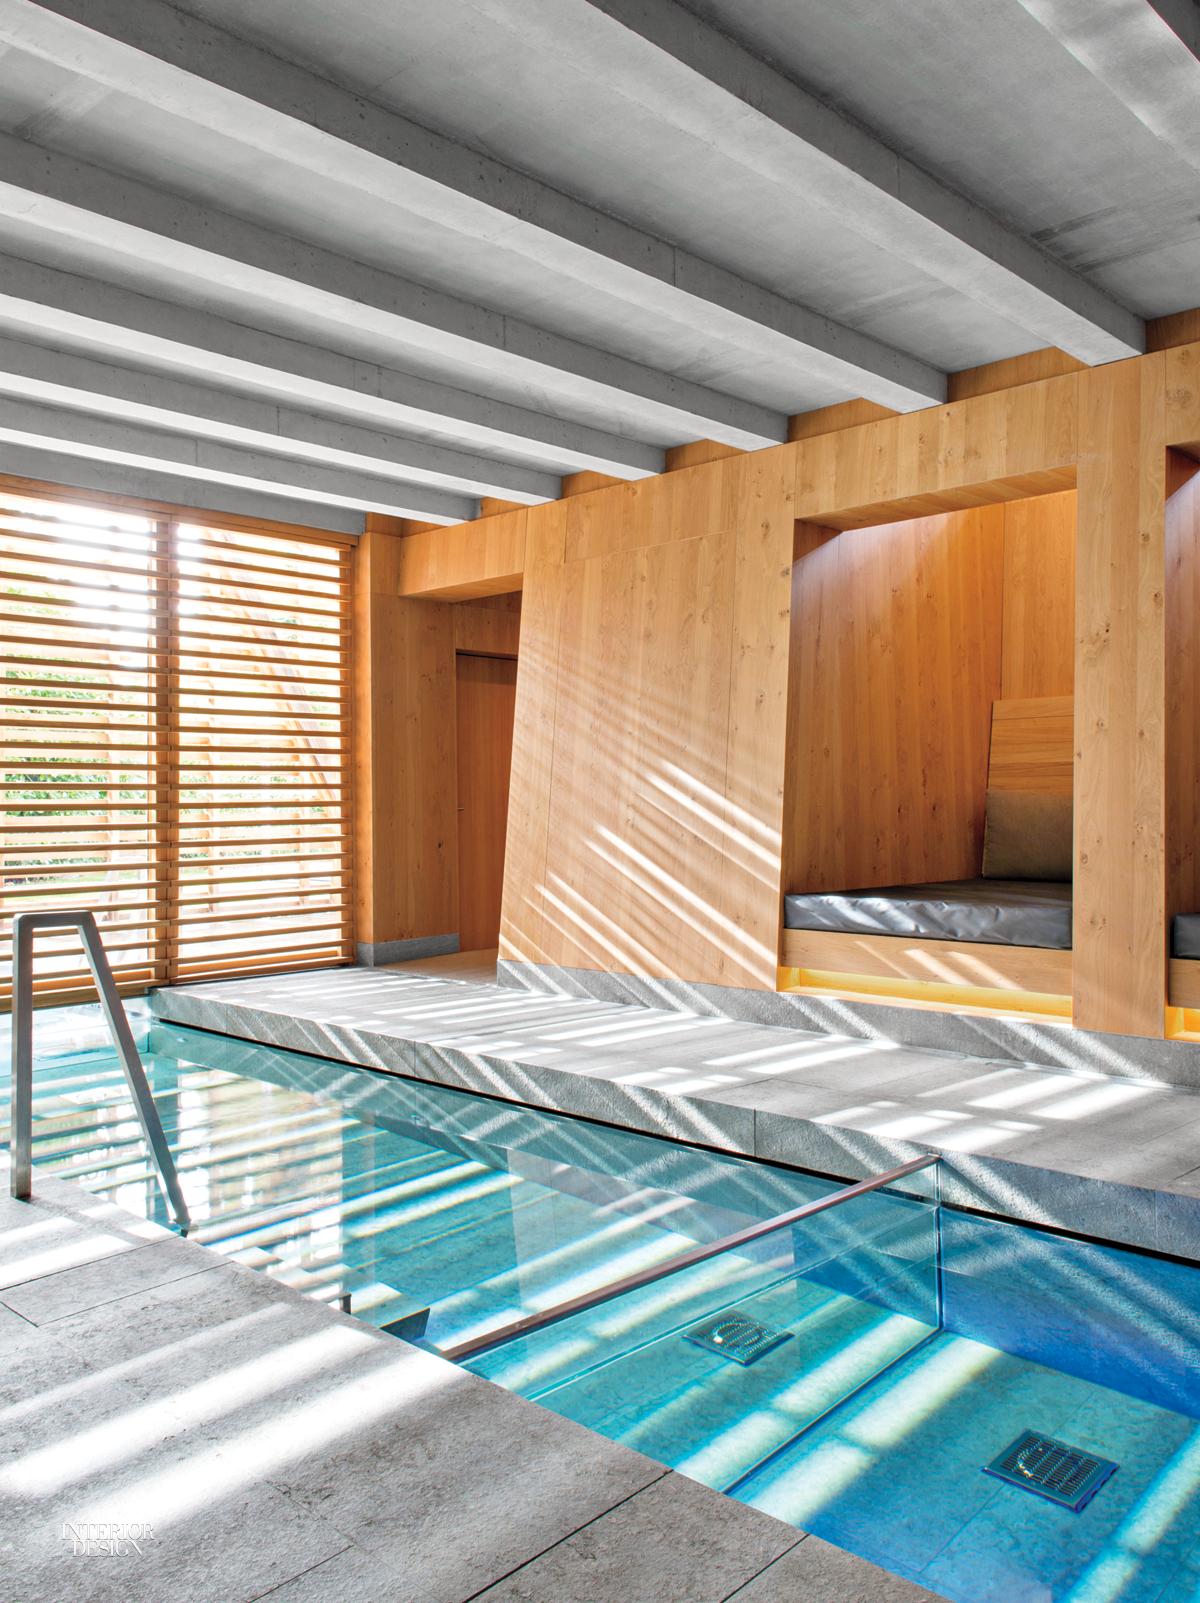 Jouin manku designs sensory annex for h tel des berges in for Pool design france